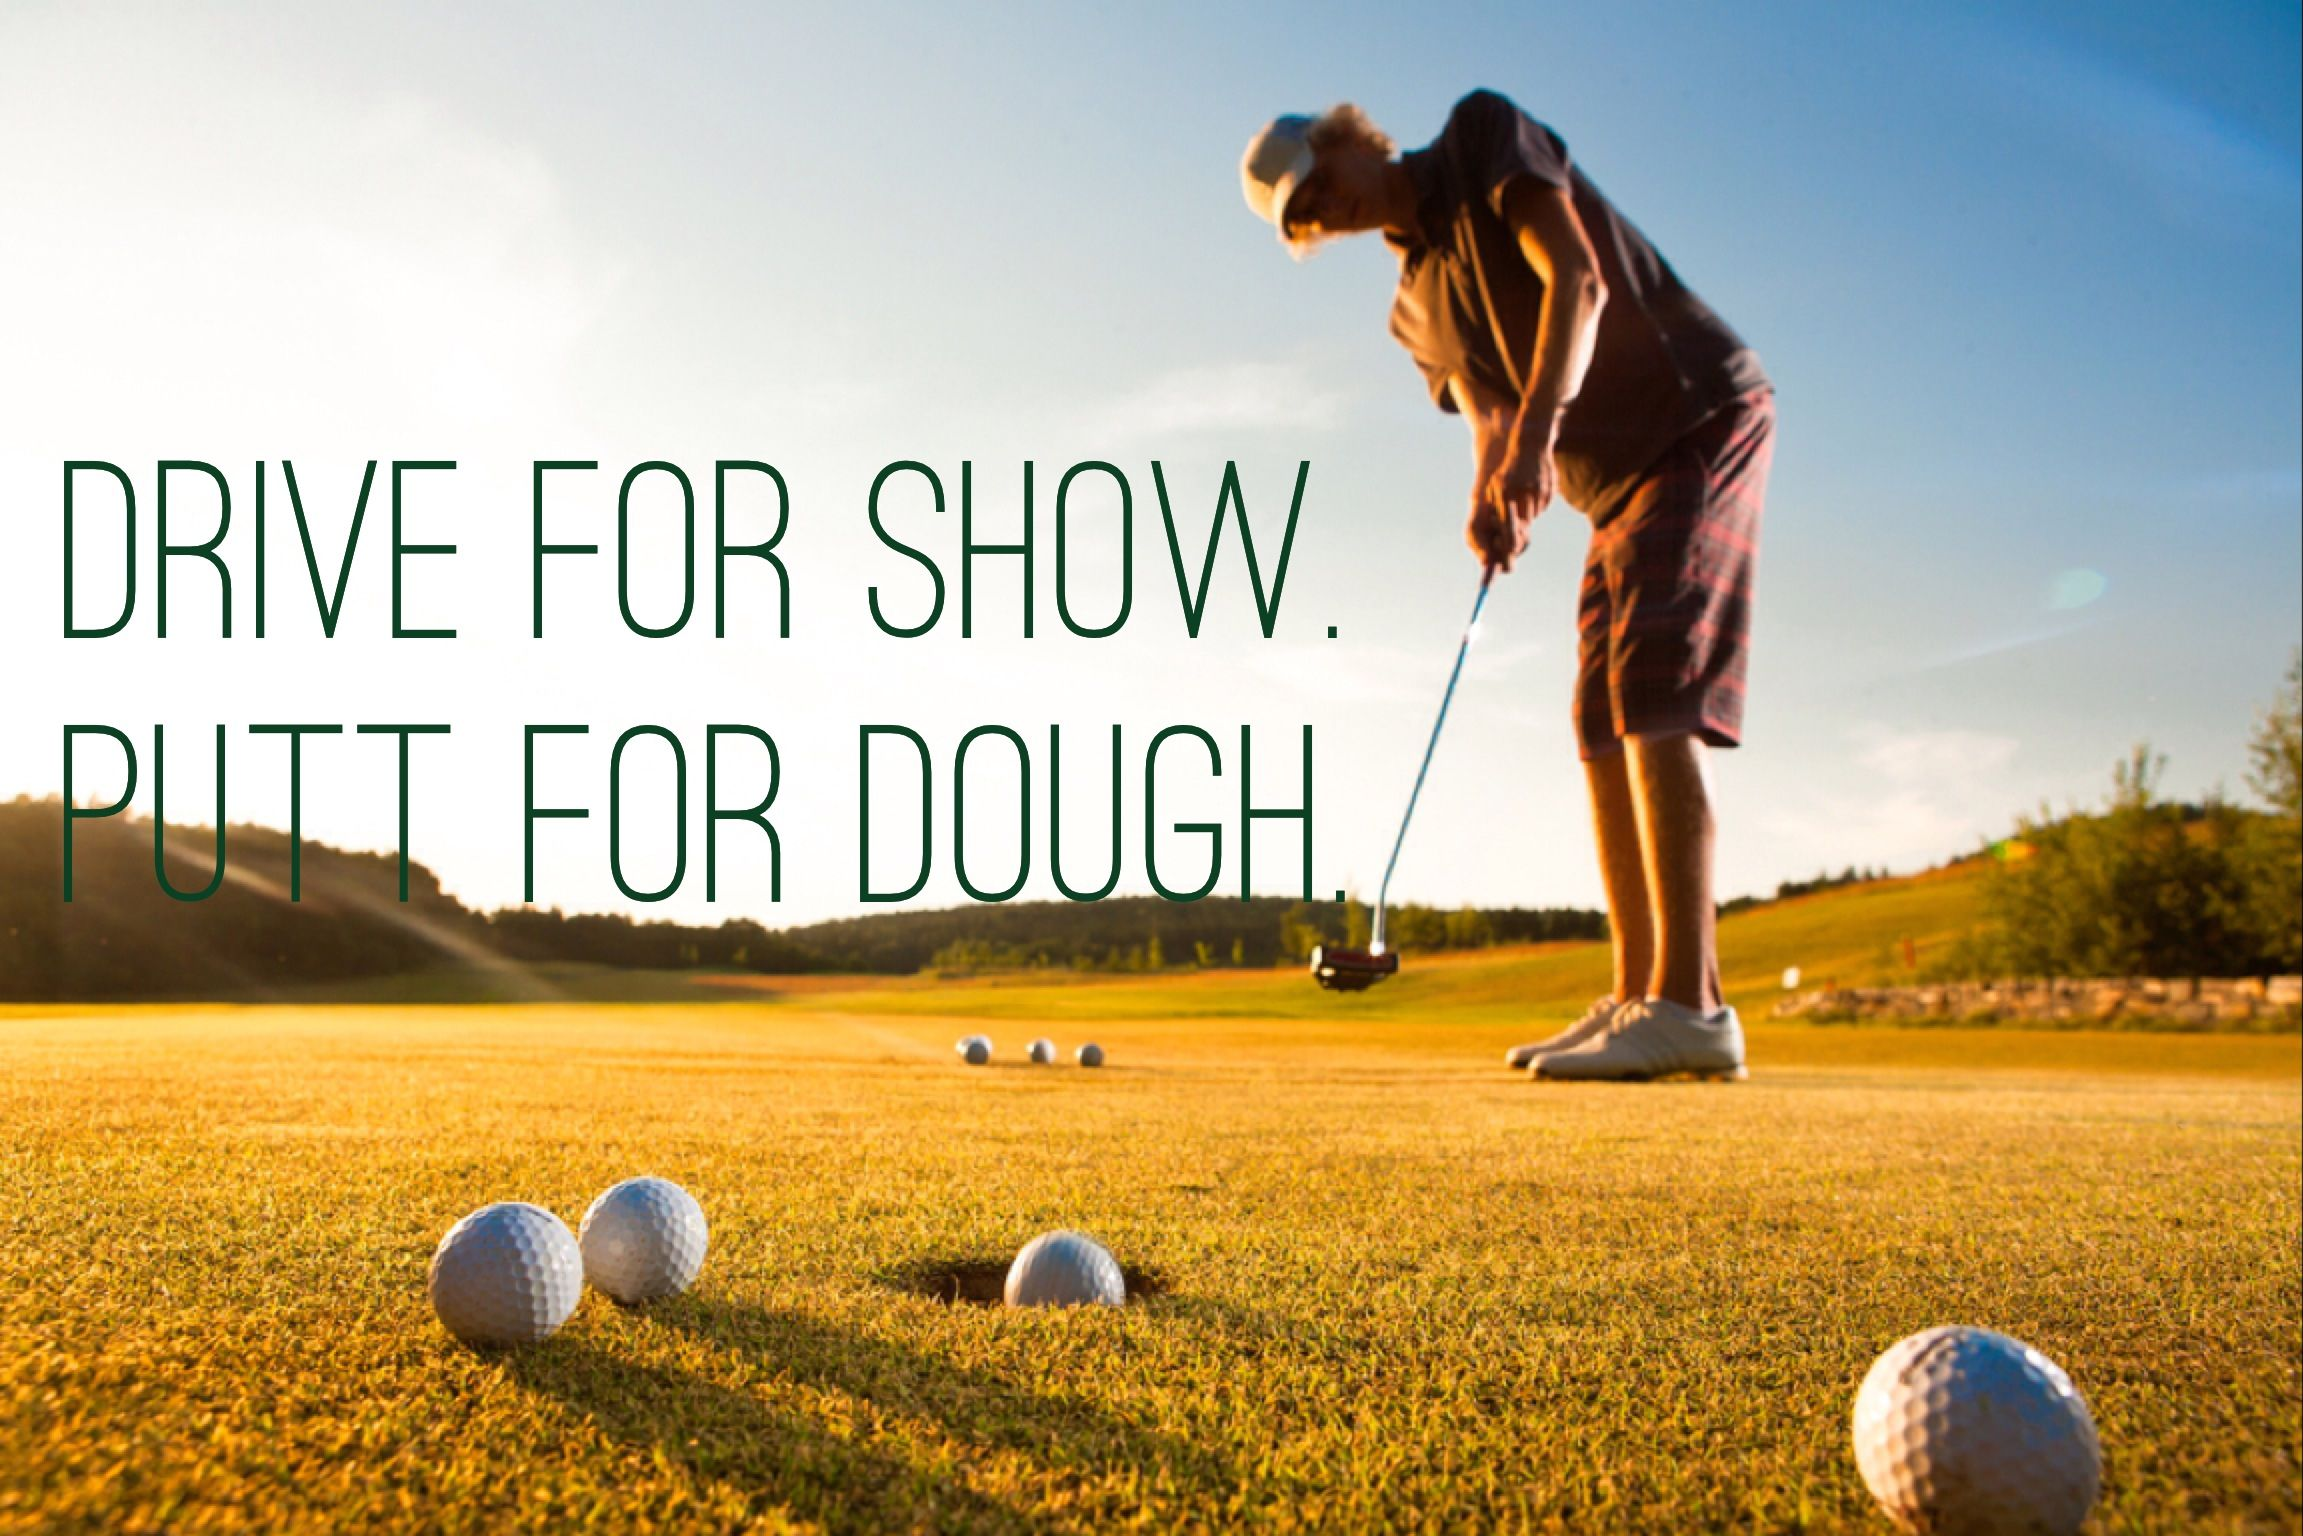 Drive For Show Putt For Dough Golf Instruction Golf Quotes Putt Putt